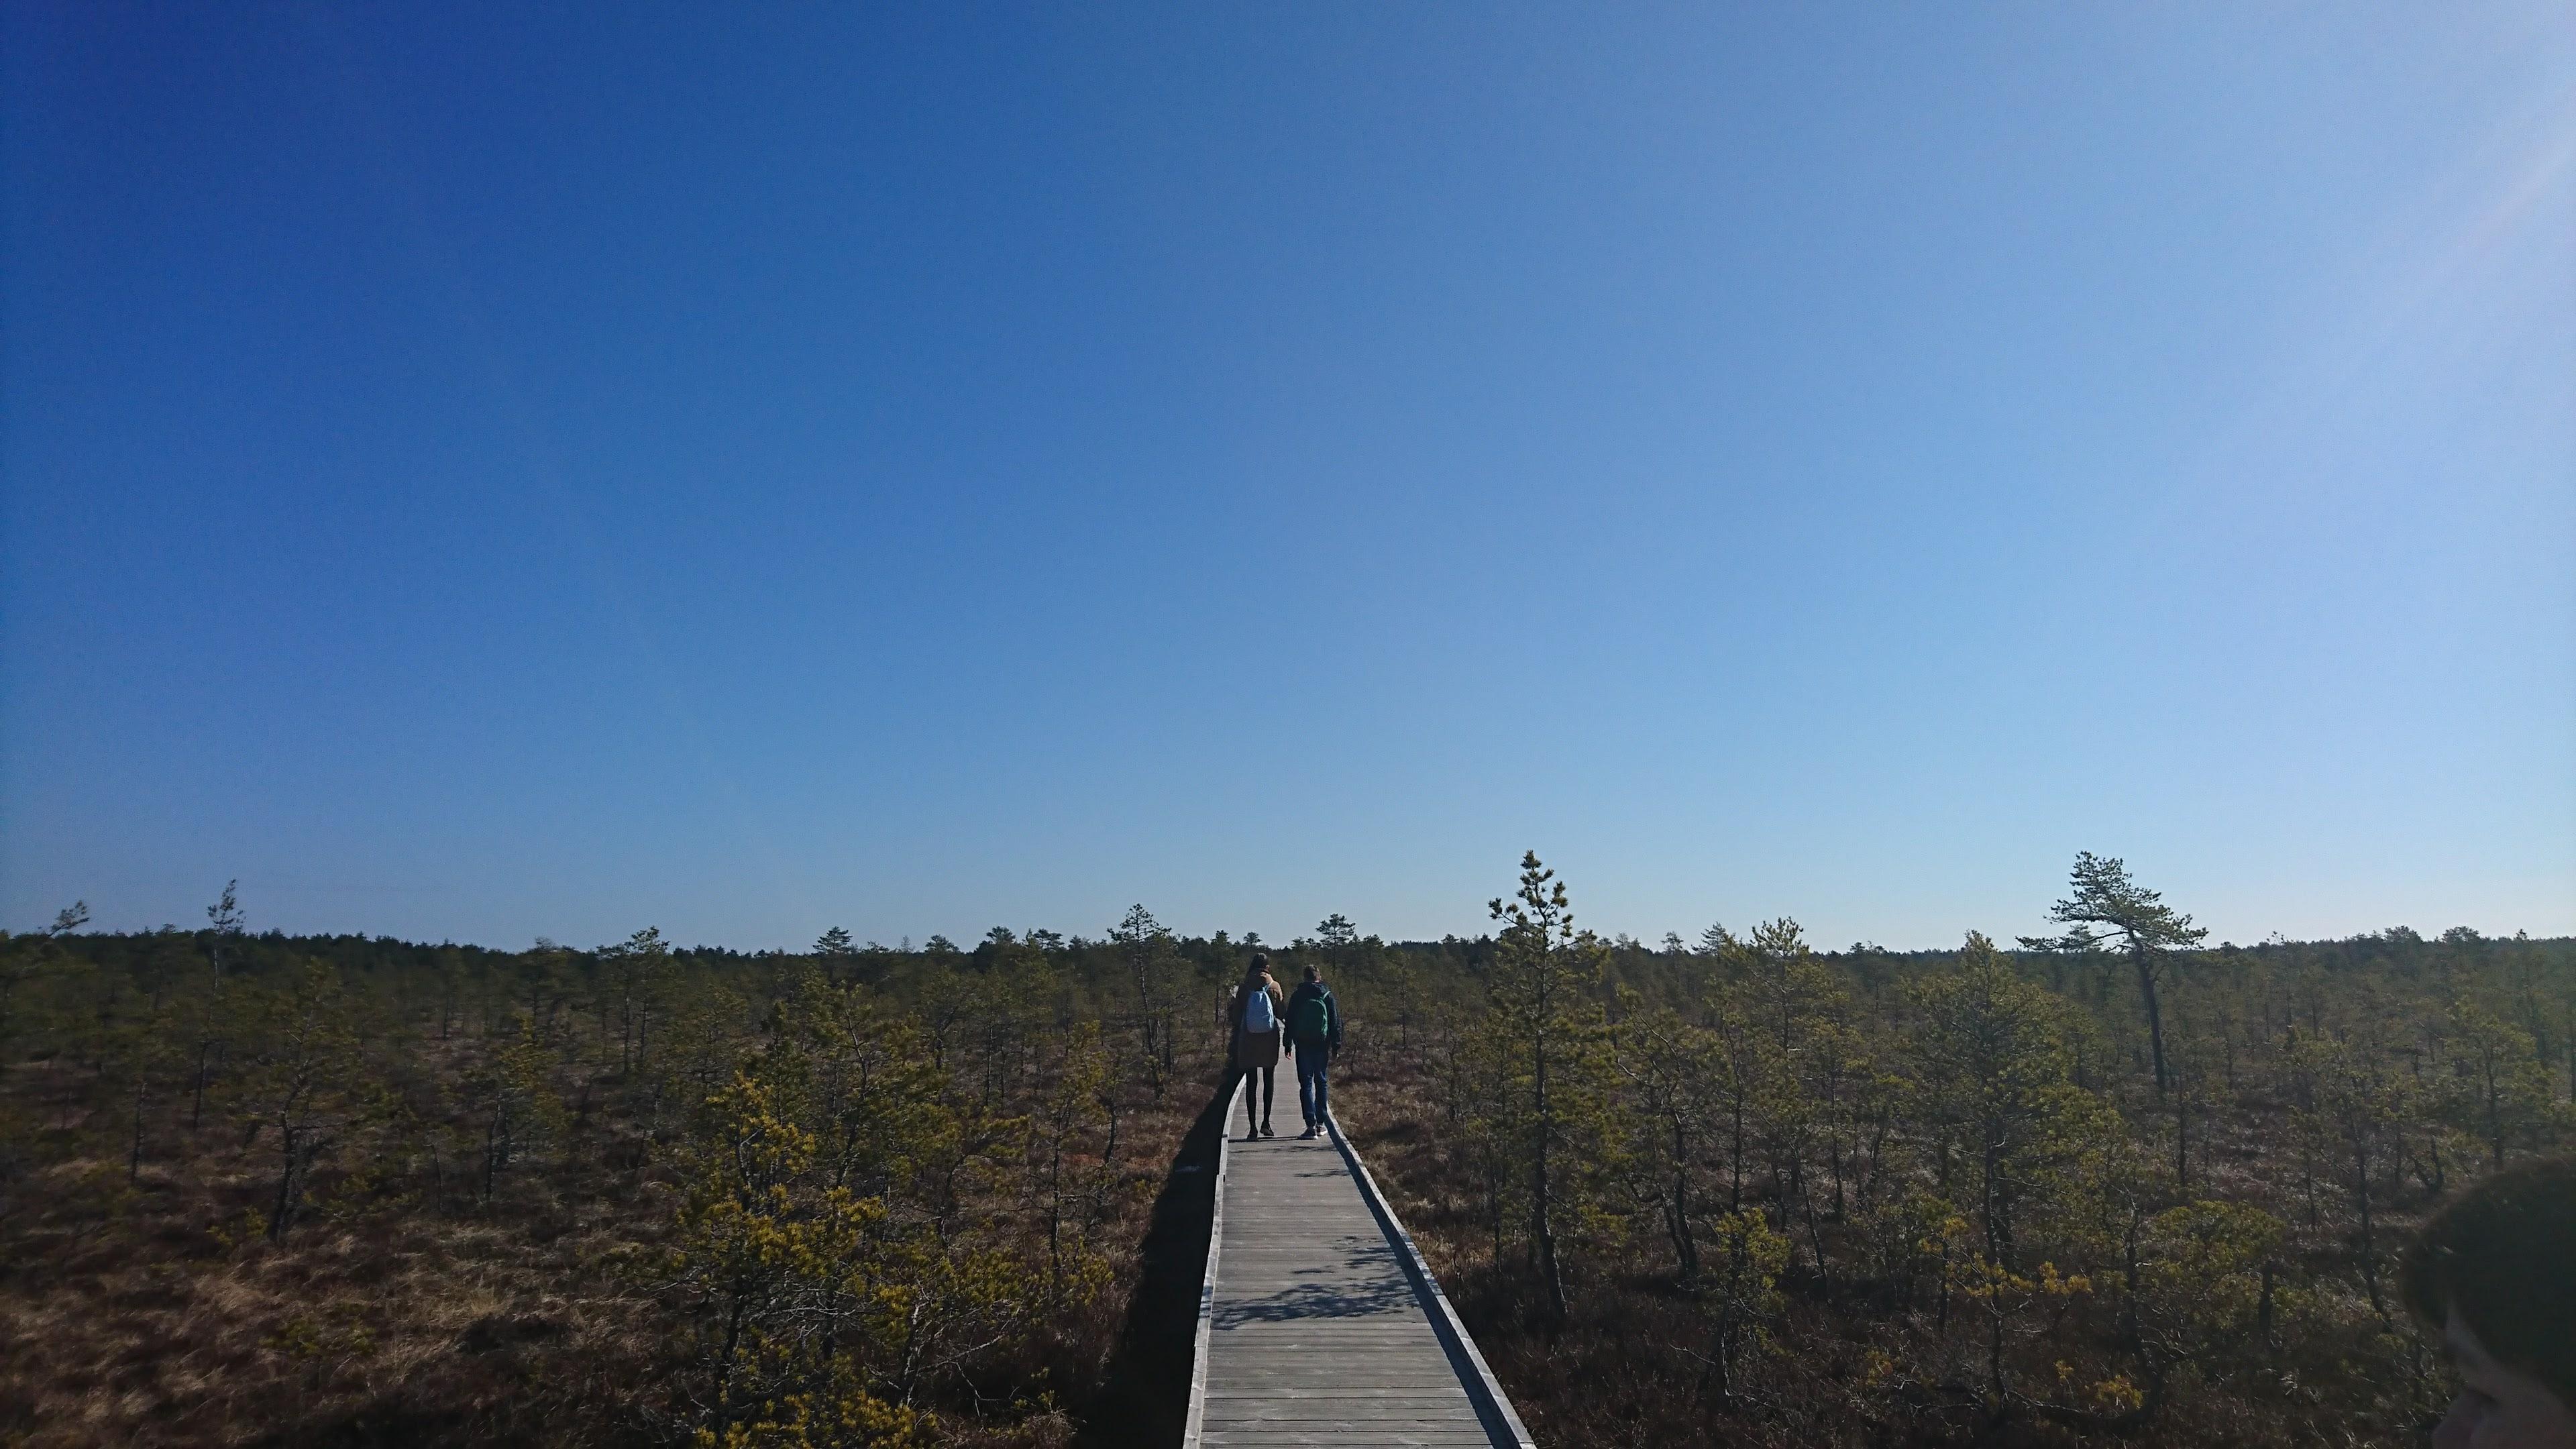 Private-Tour-Lahemaa National Park Viru Bog